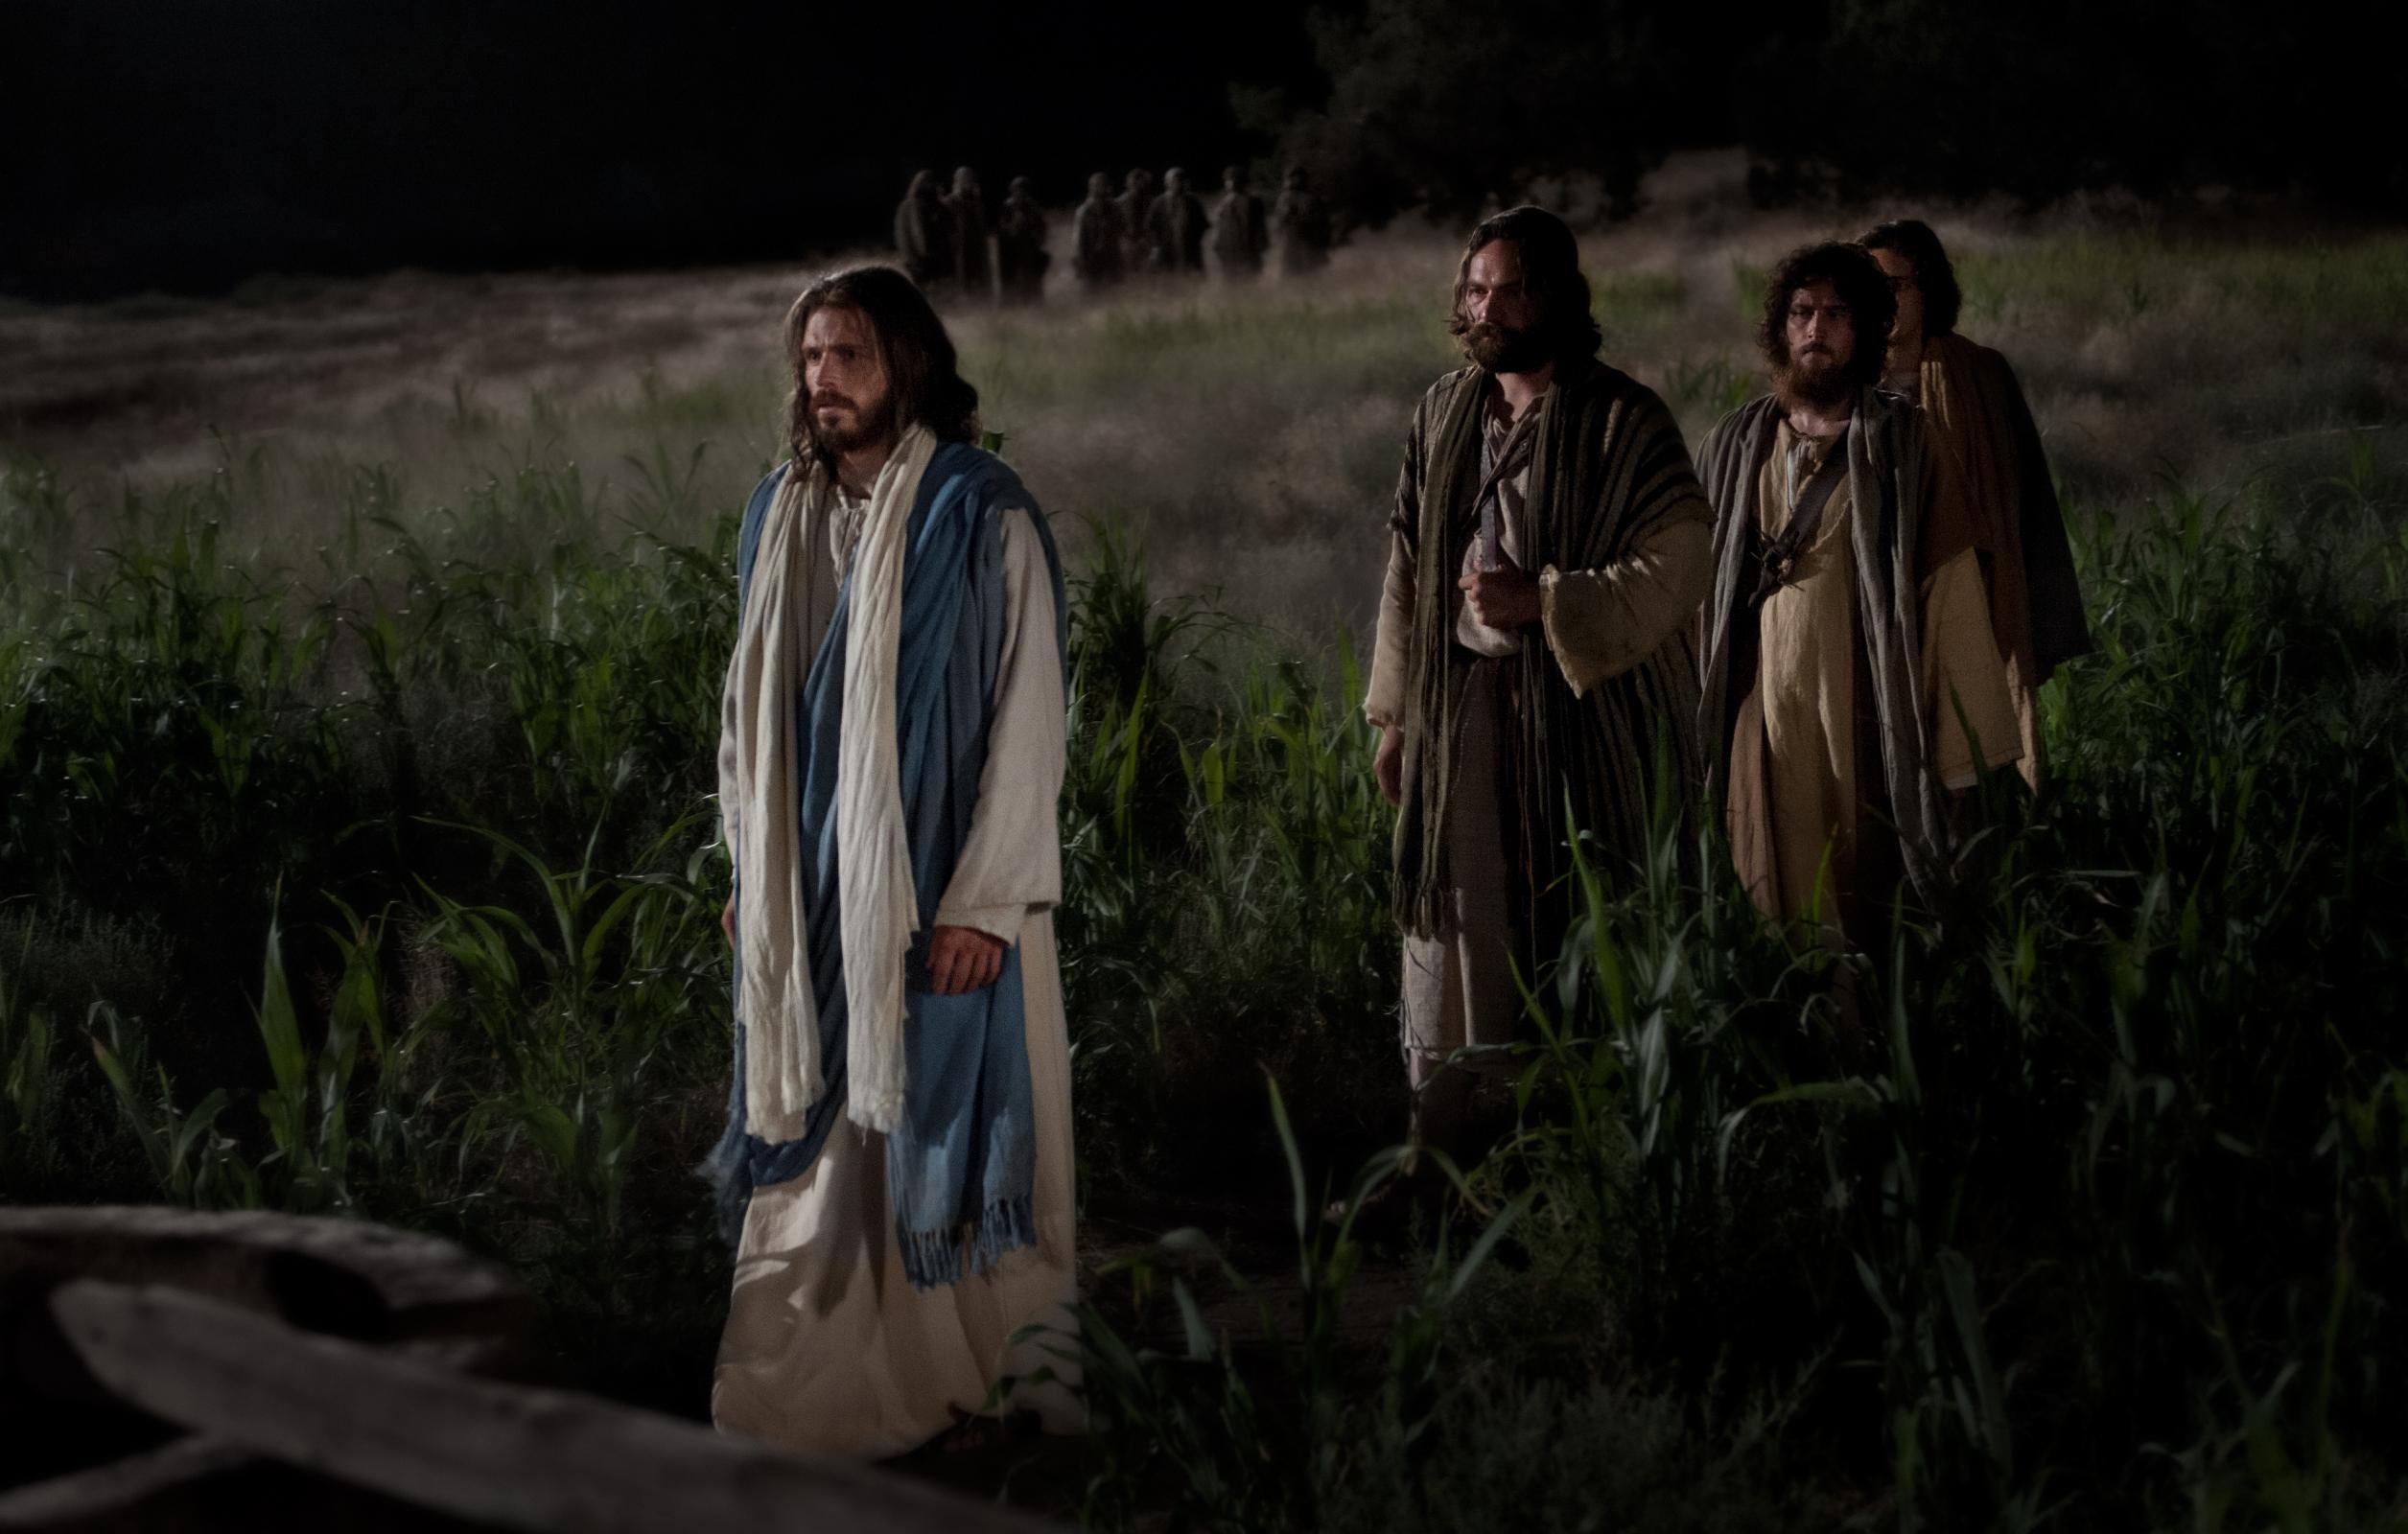 Christ Walks into the Garden